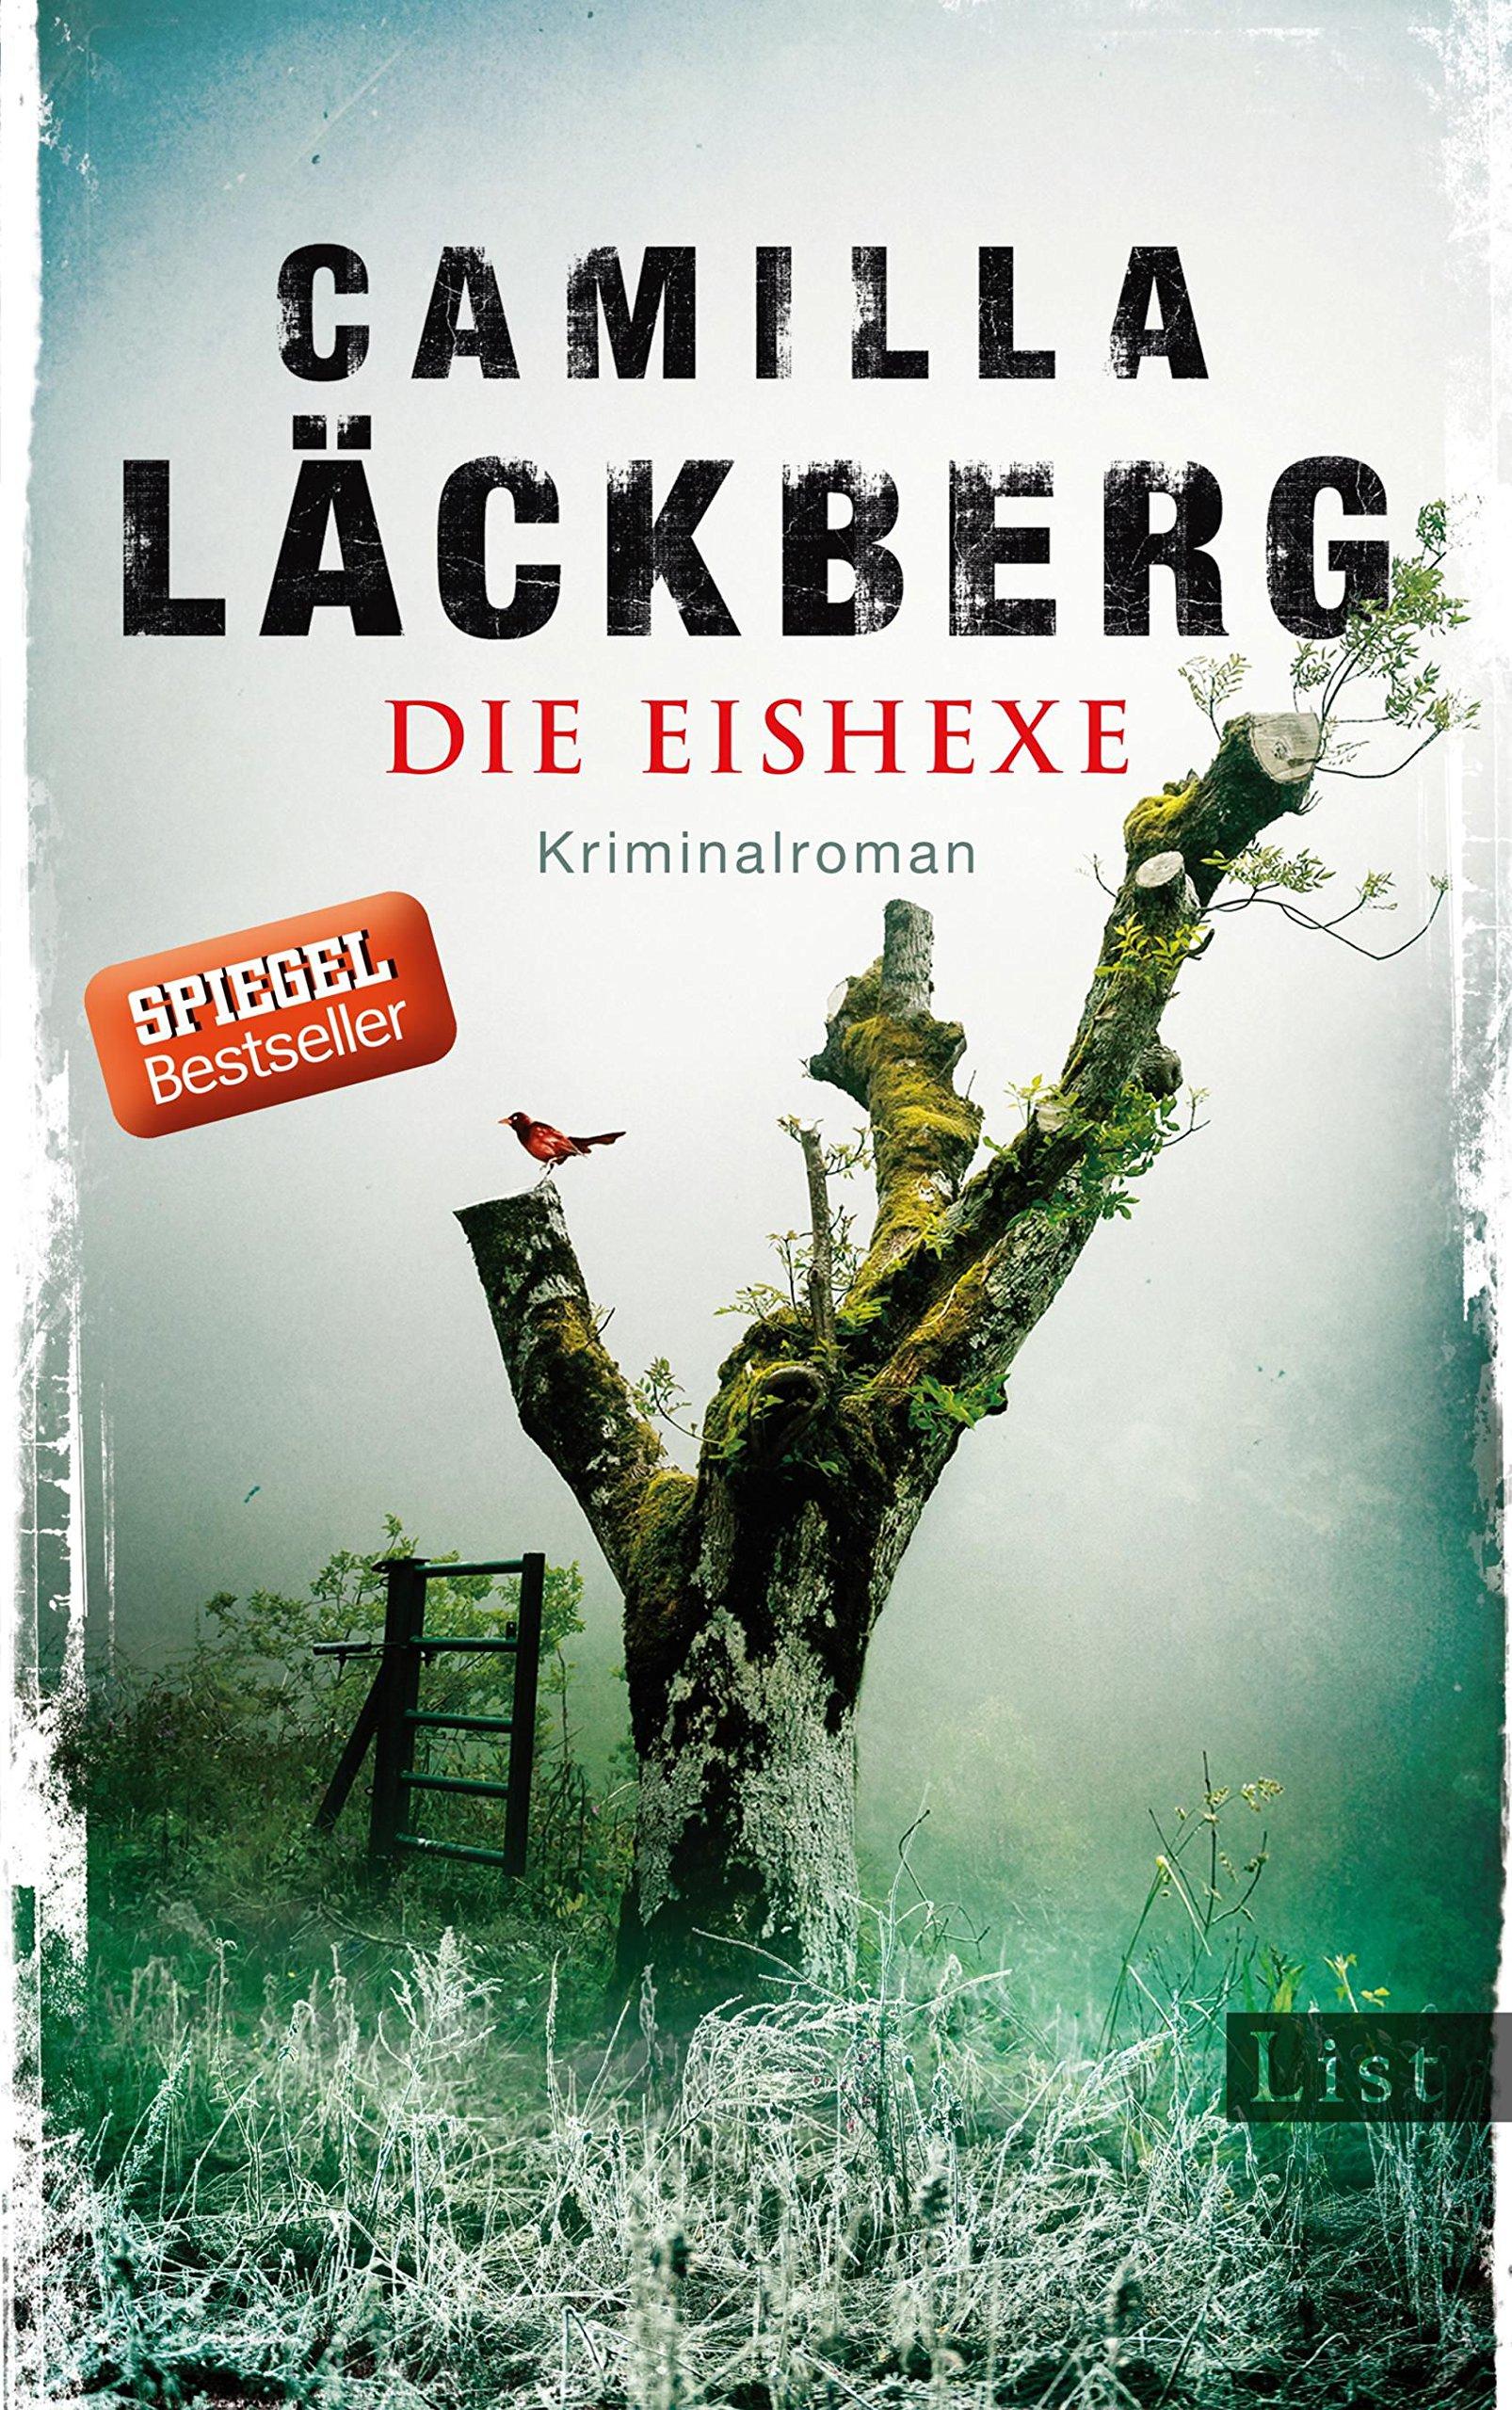 Die Eishexe: Kriminalroman (Ein Falck-Hedström-Krimi, Band 10) Gebundenes Buch – 2. Januar 2018 Camilla Läckberg Katrin Frey List Hardcover 3471351078